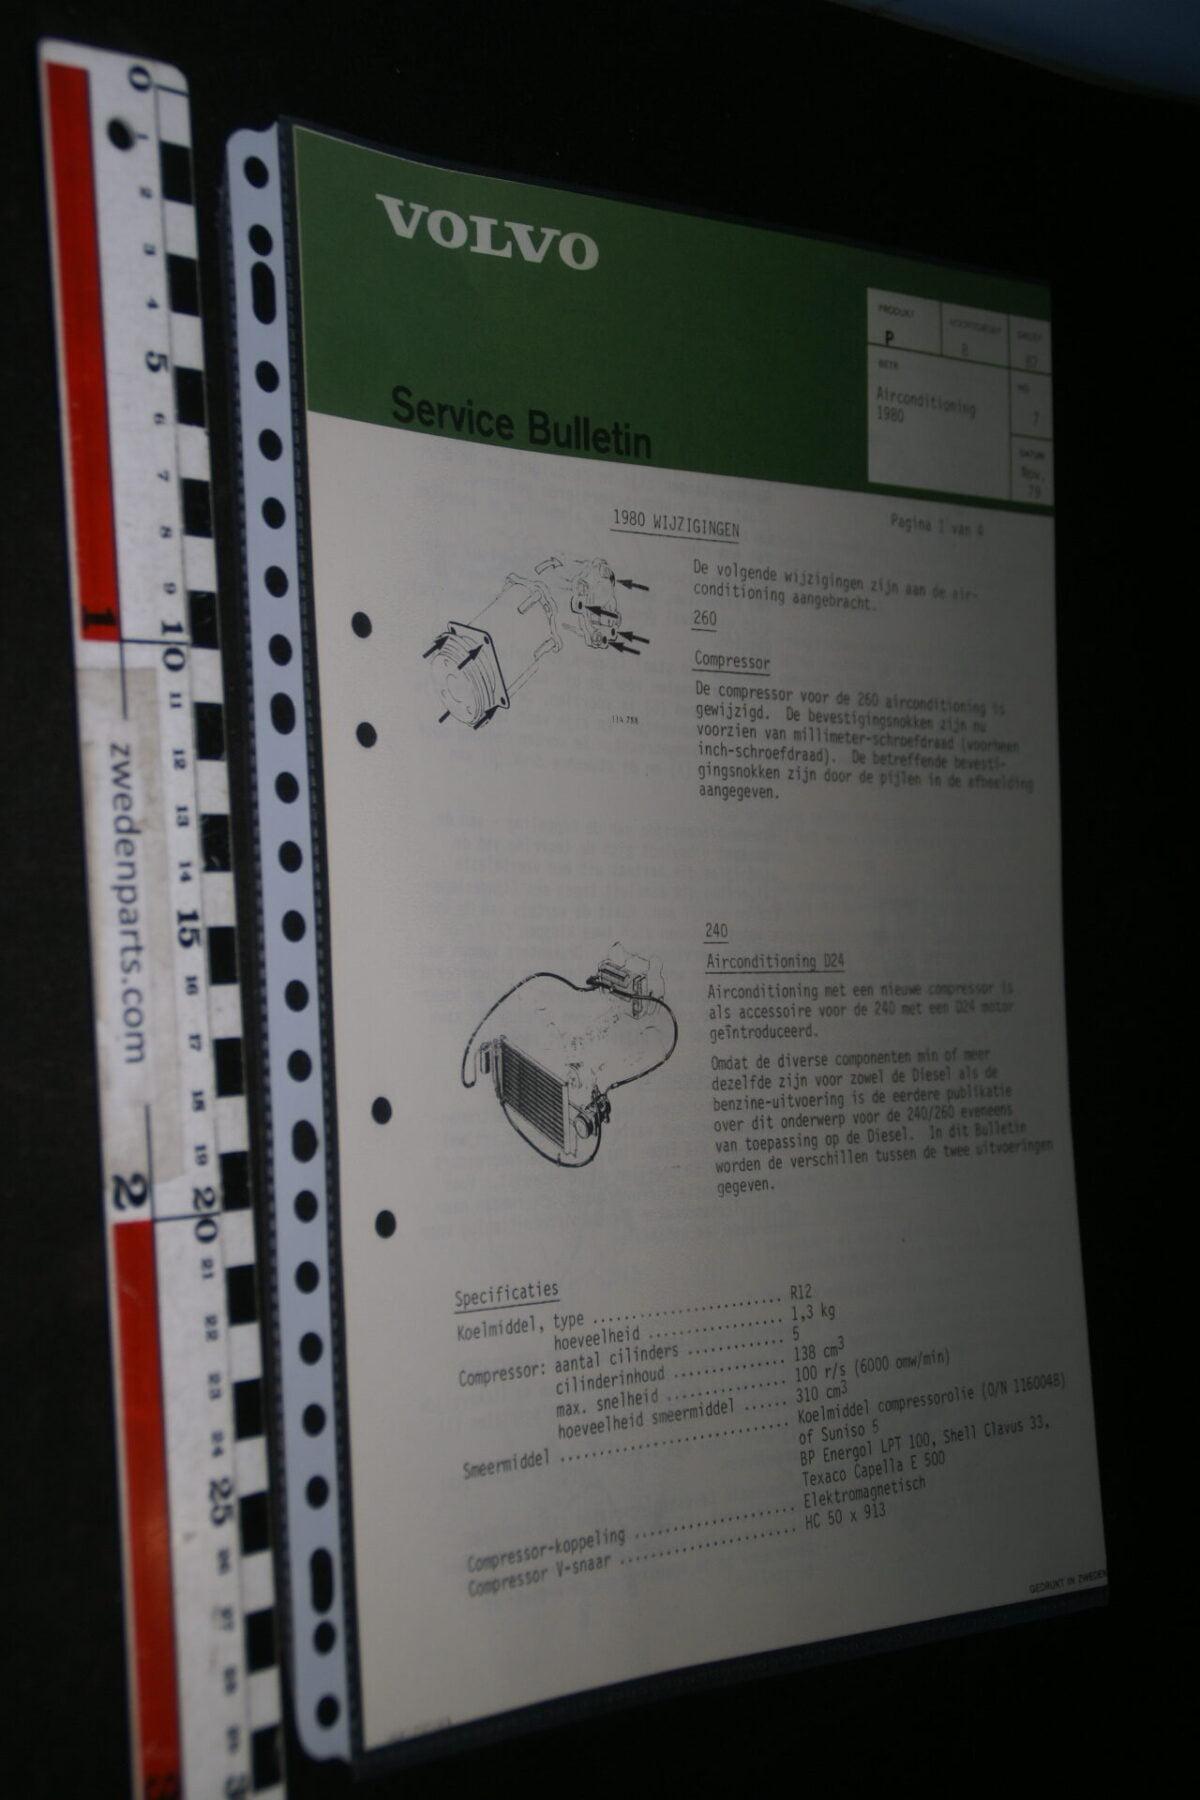 DSC07656 1979 origineel Volvo werkplaatsboek servicebulletin airconditioning-b7dddf21